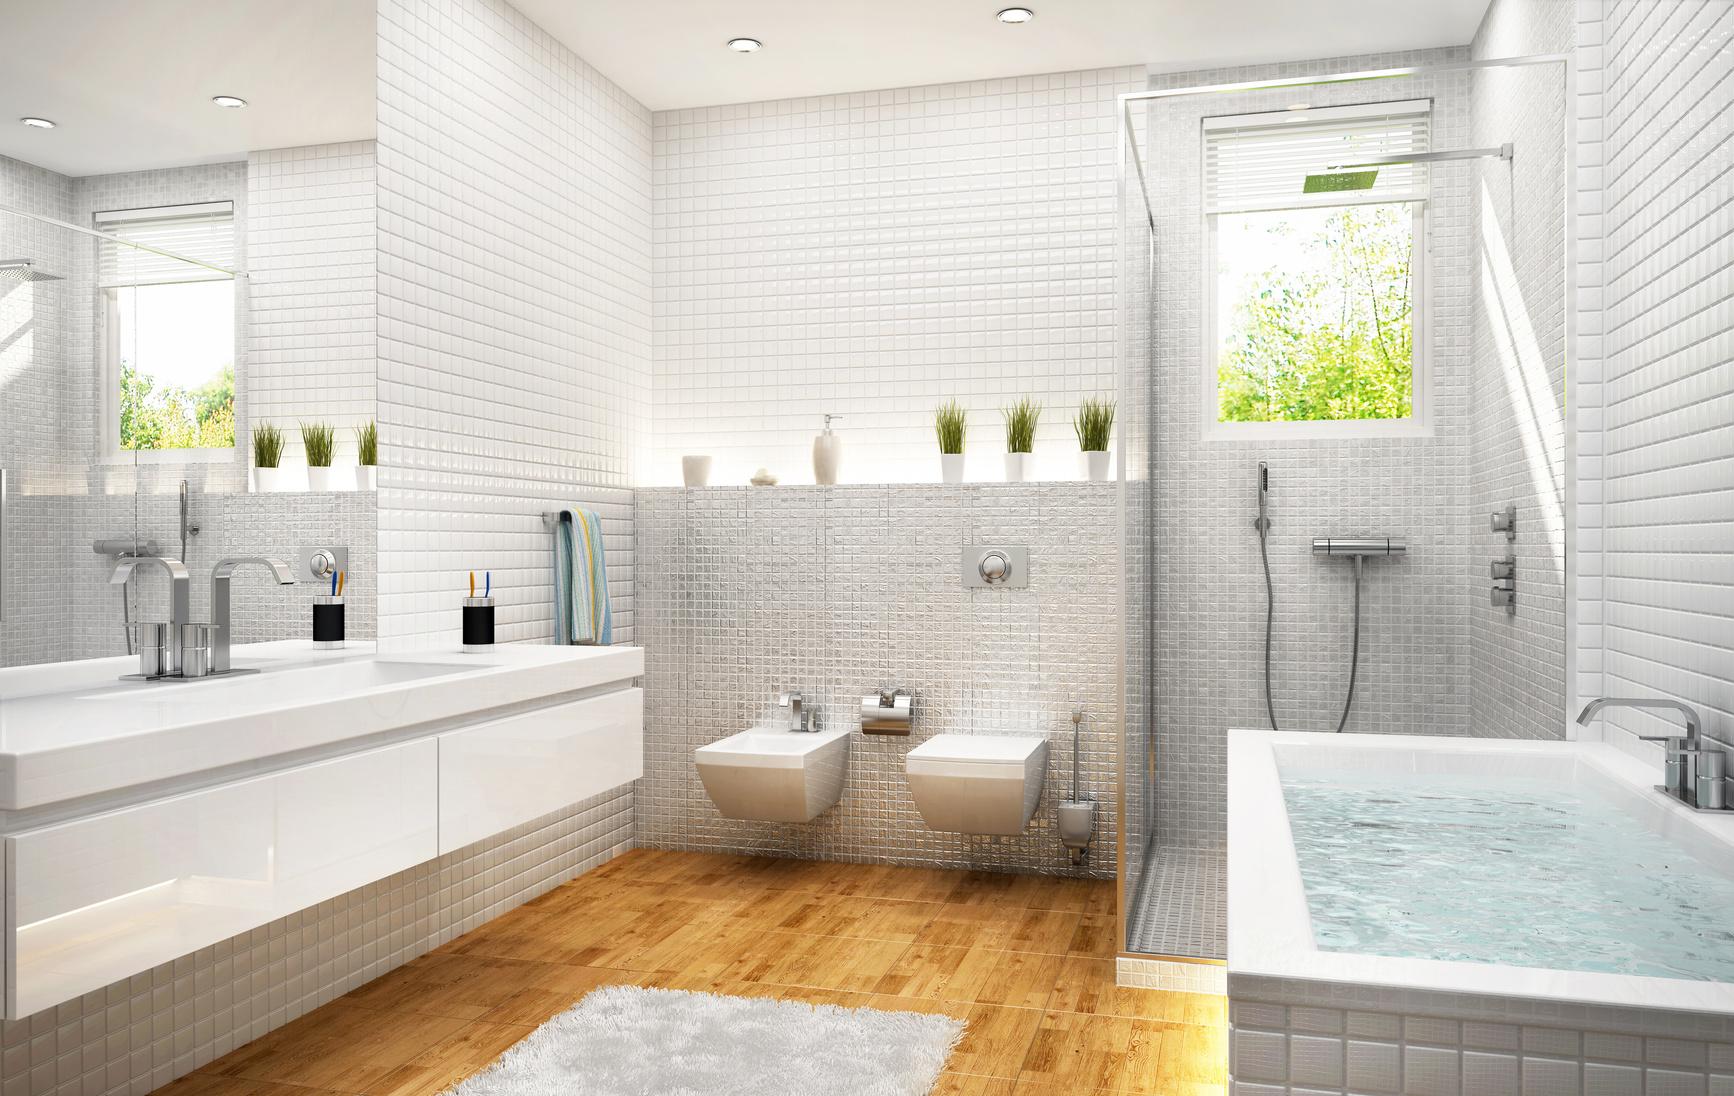 Edles für Badezimmer – Parkett in Sanitärräumen - Schmitt